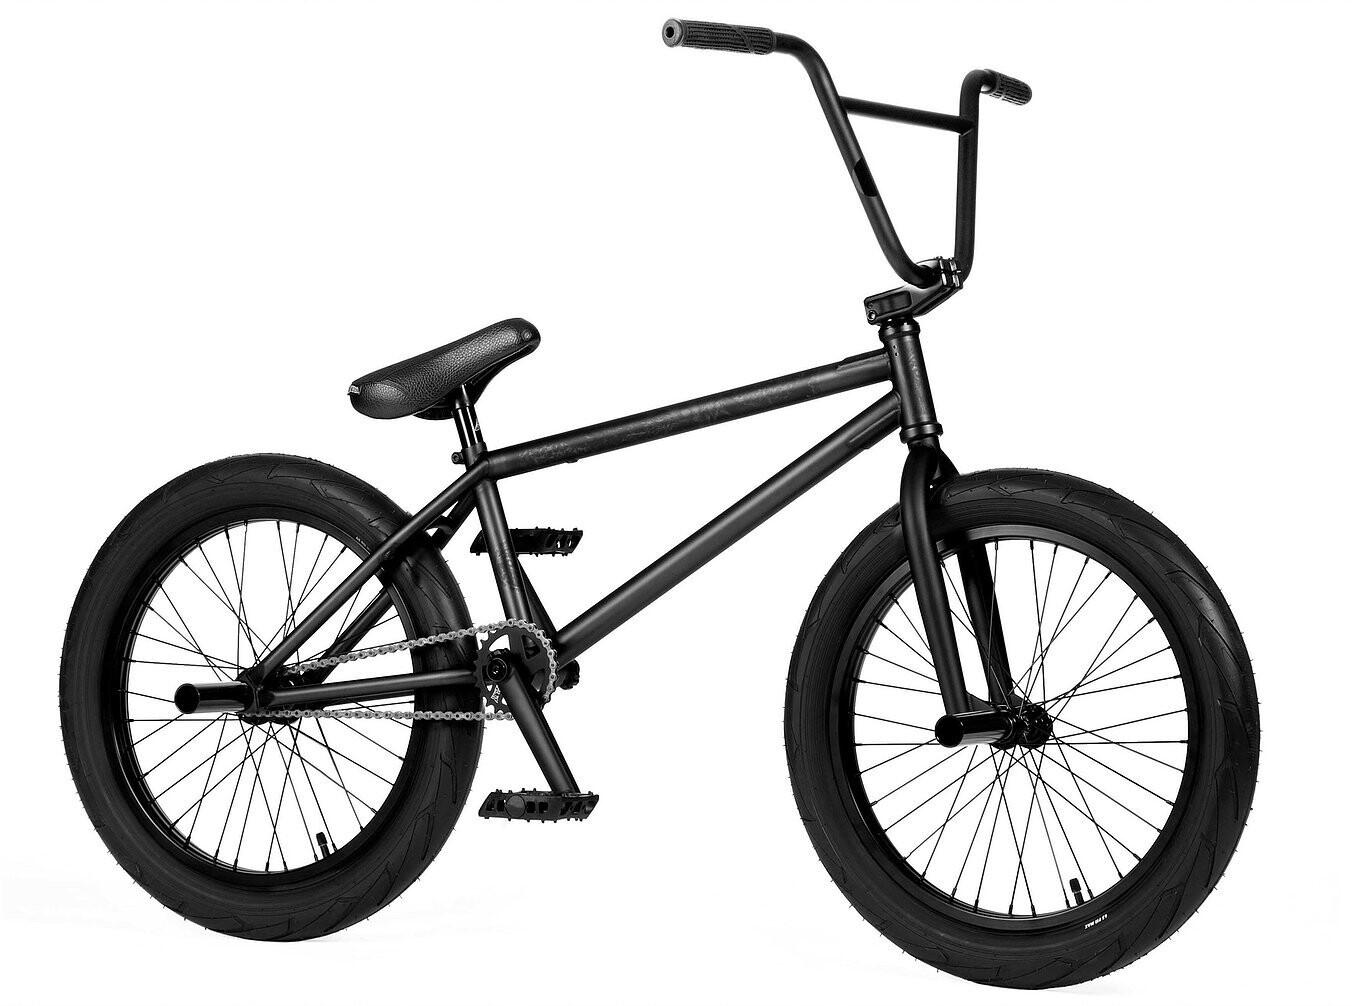 Stereo Bikes Plug In 20